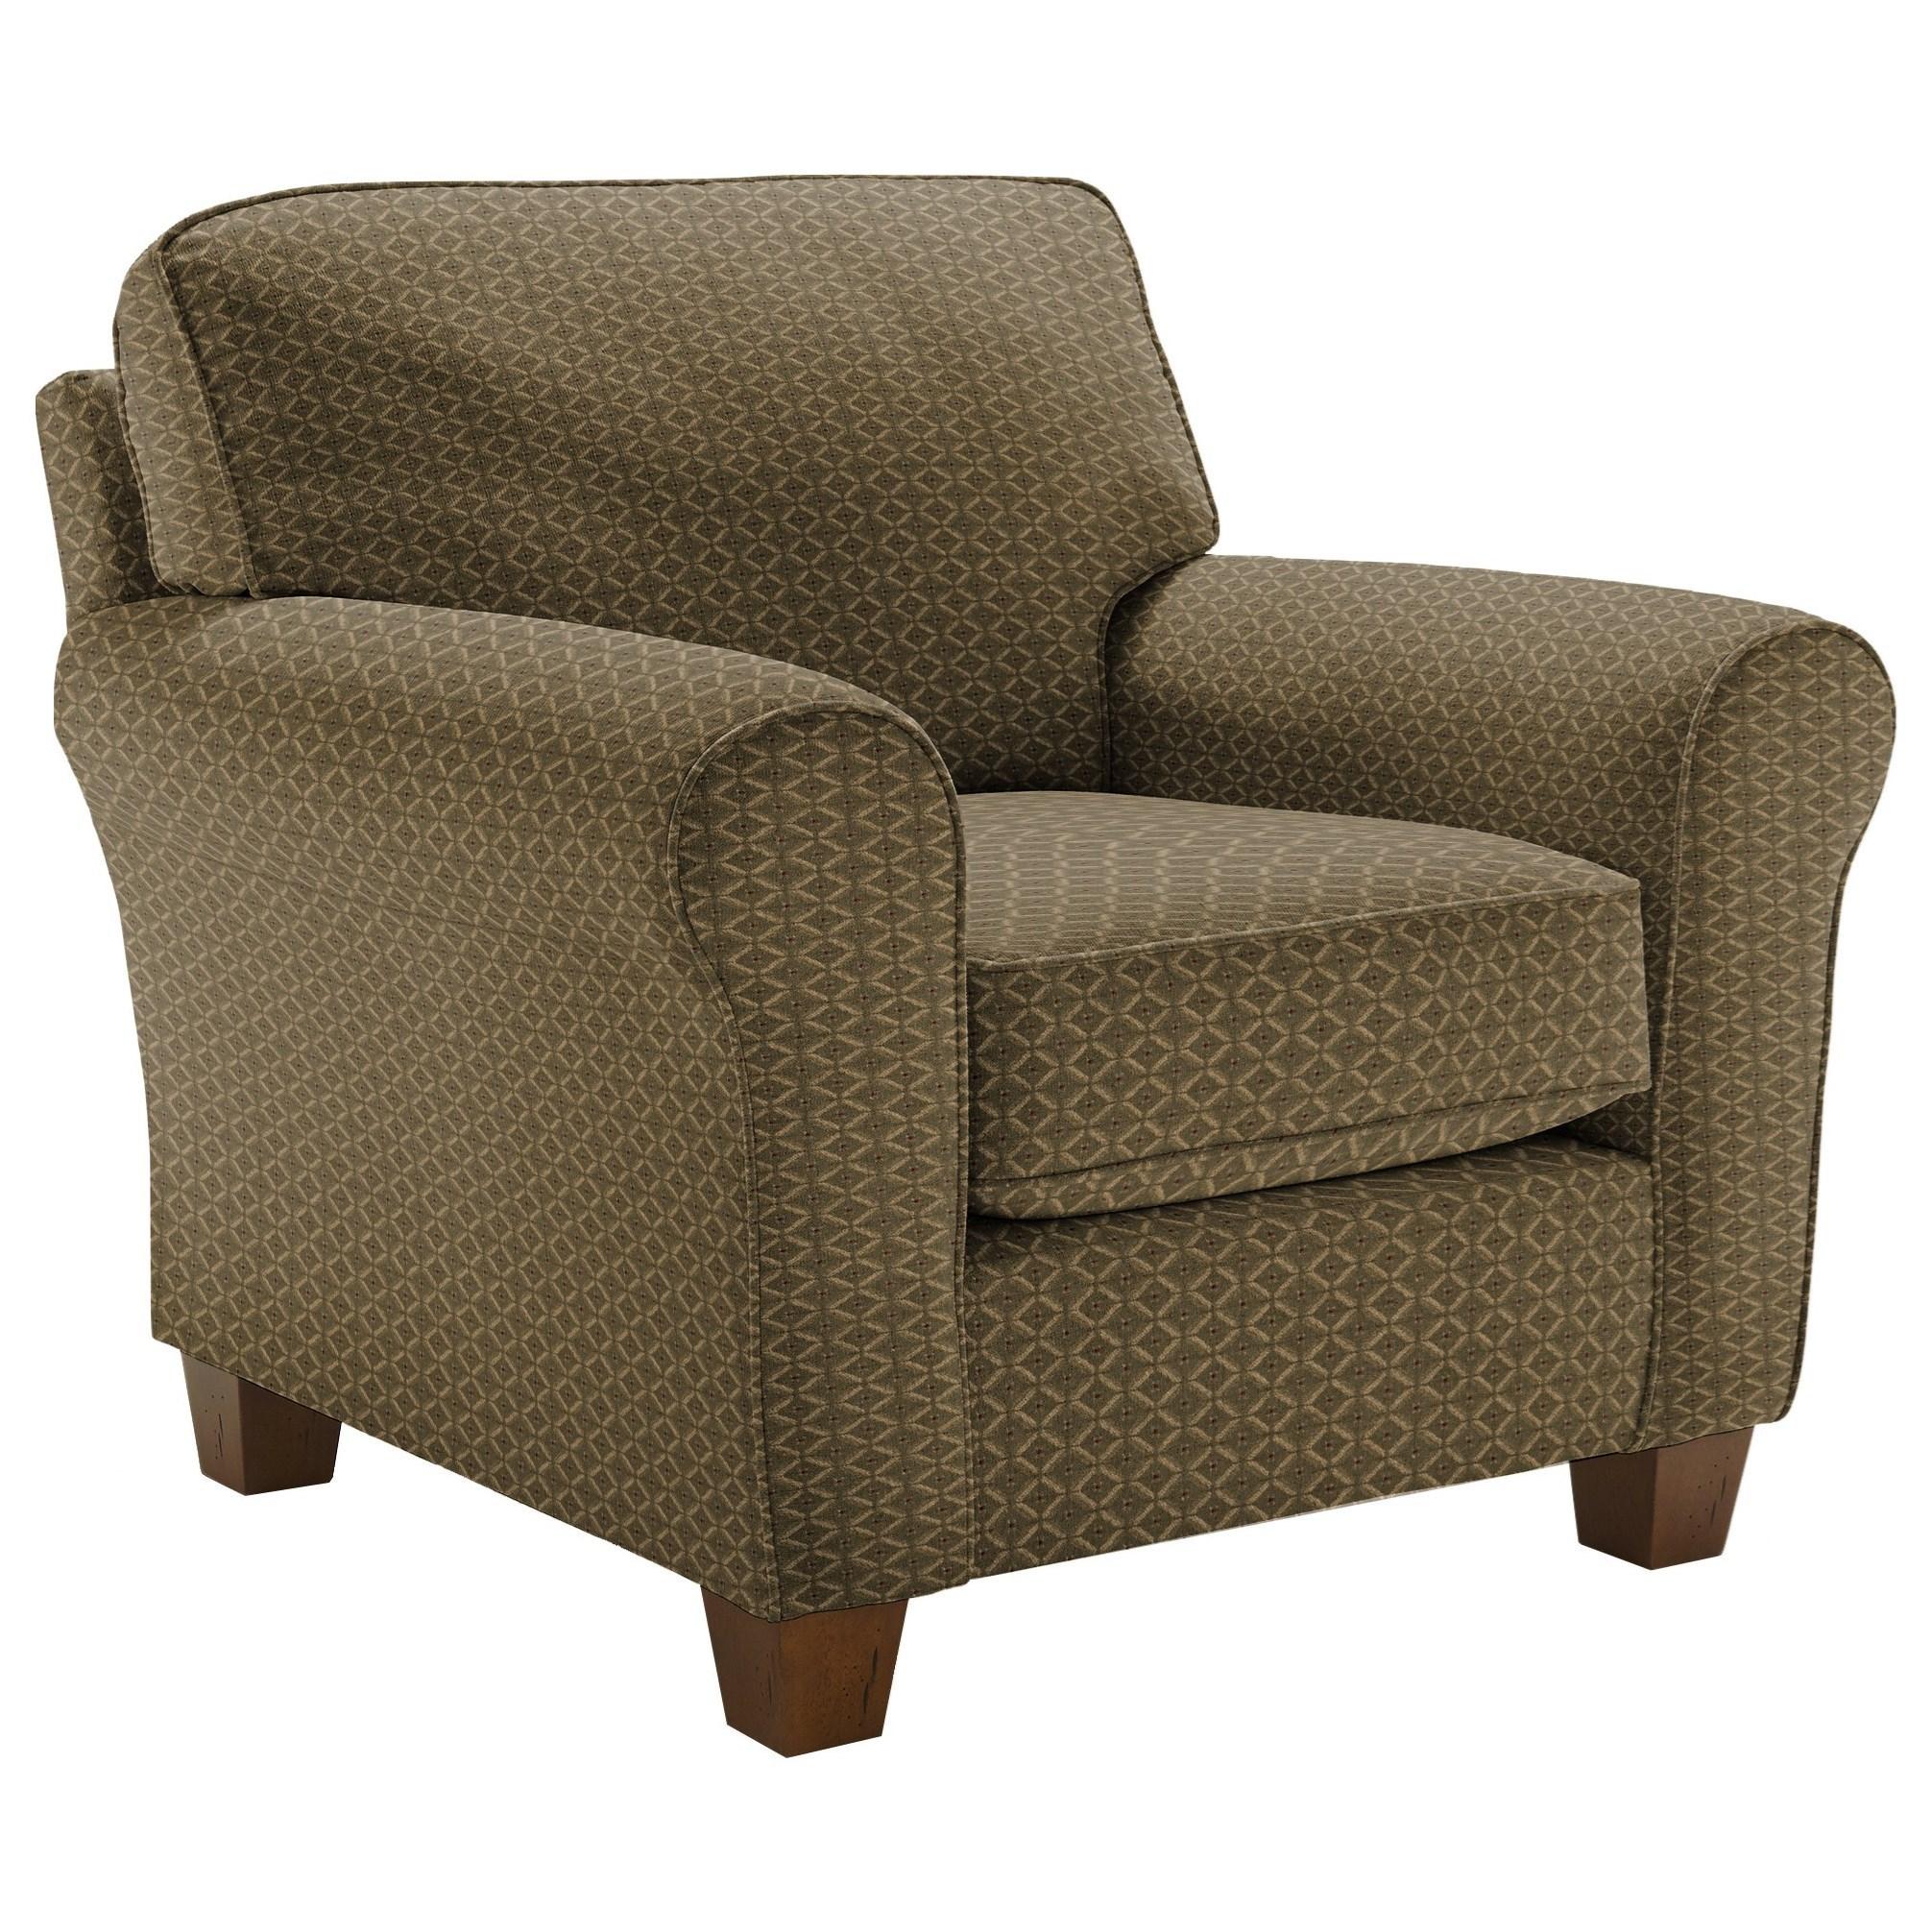 Annabel  <b>Custom</b> Chair by Best Home Furnishings at Lapeer Furniture & Mattress Center